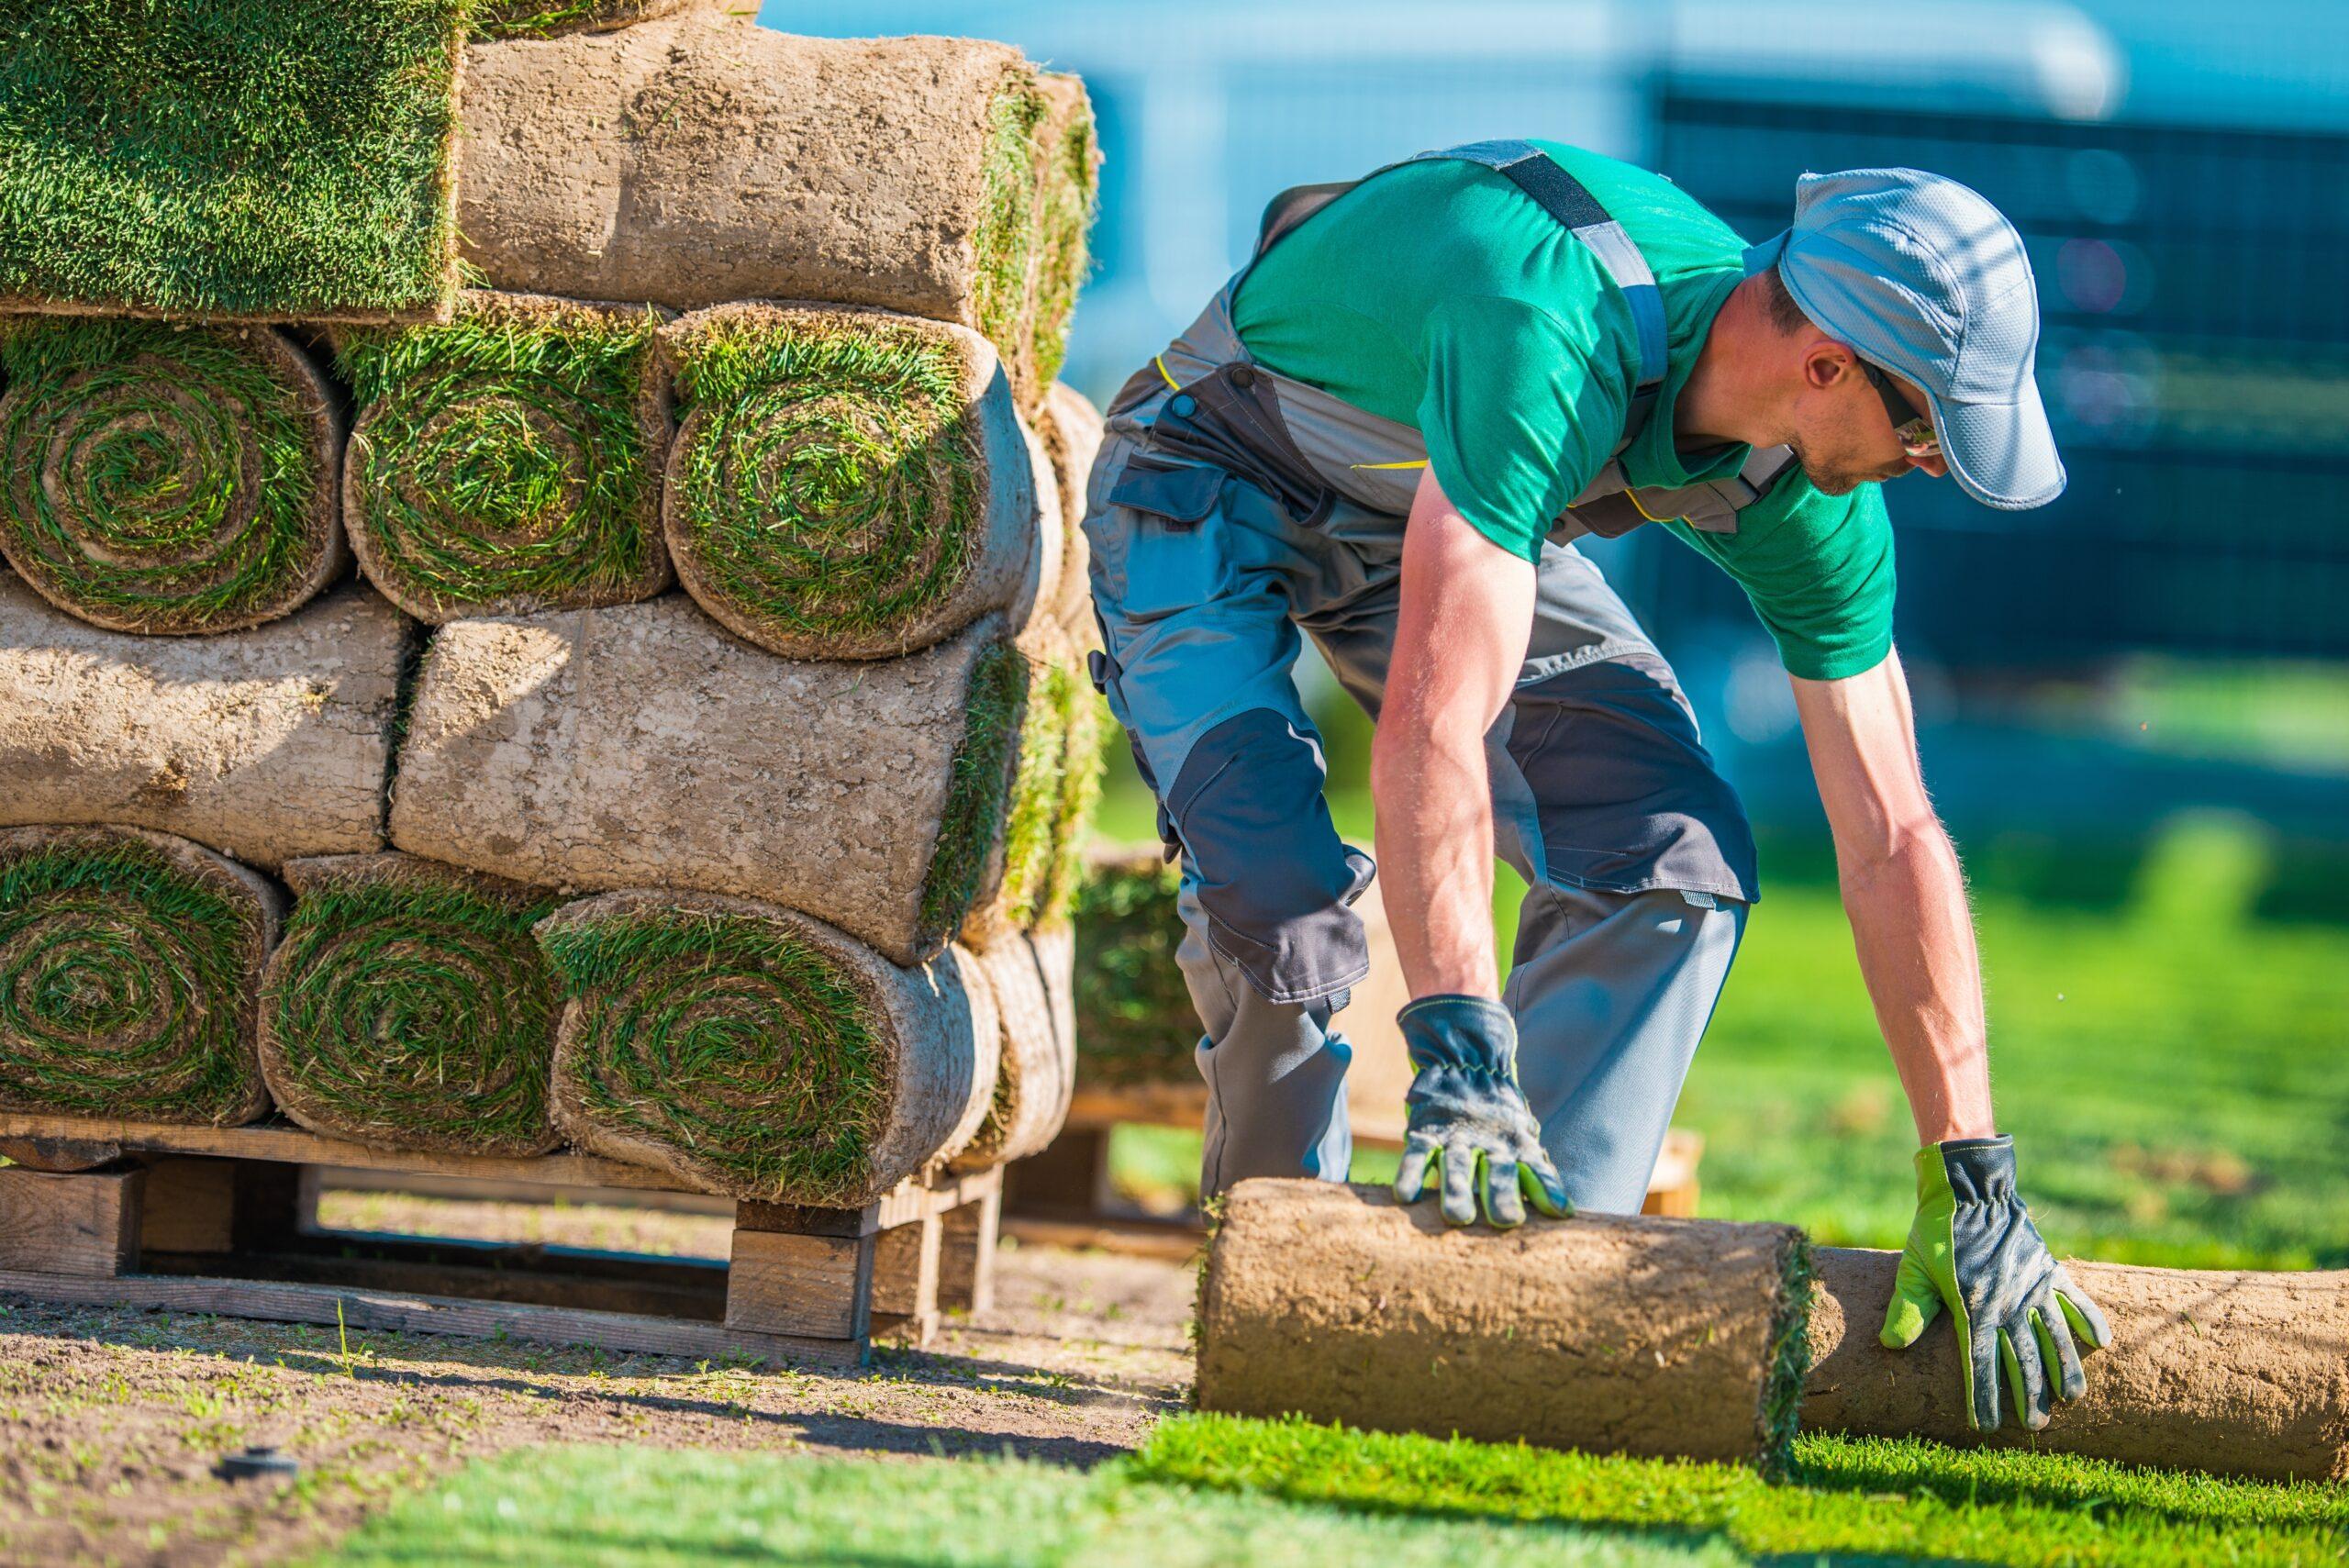 Landscaping Company in Boca Raton